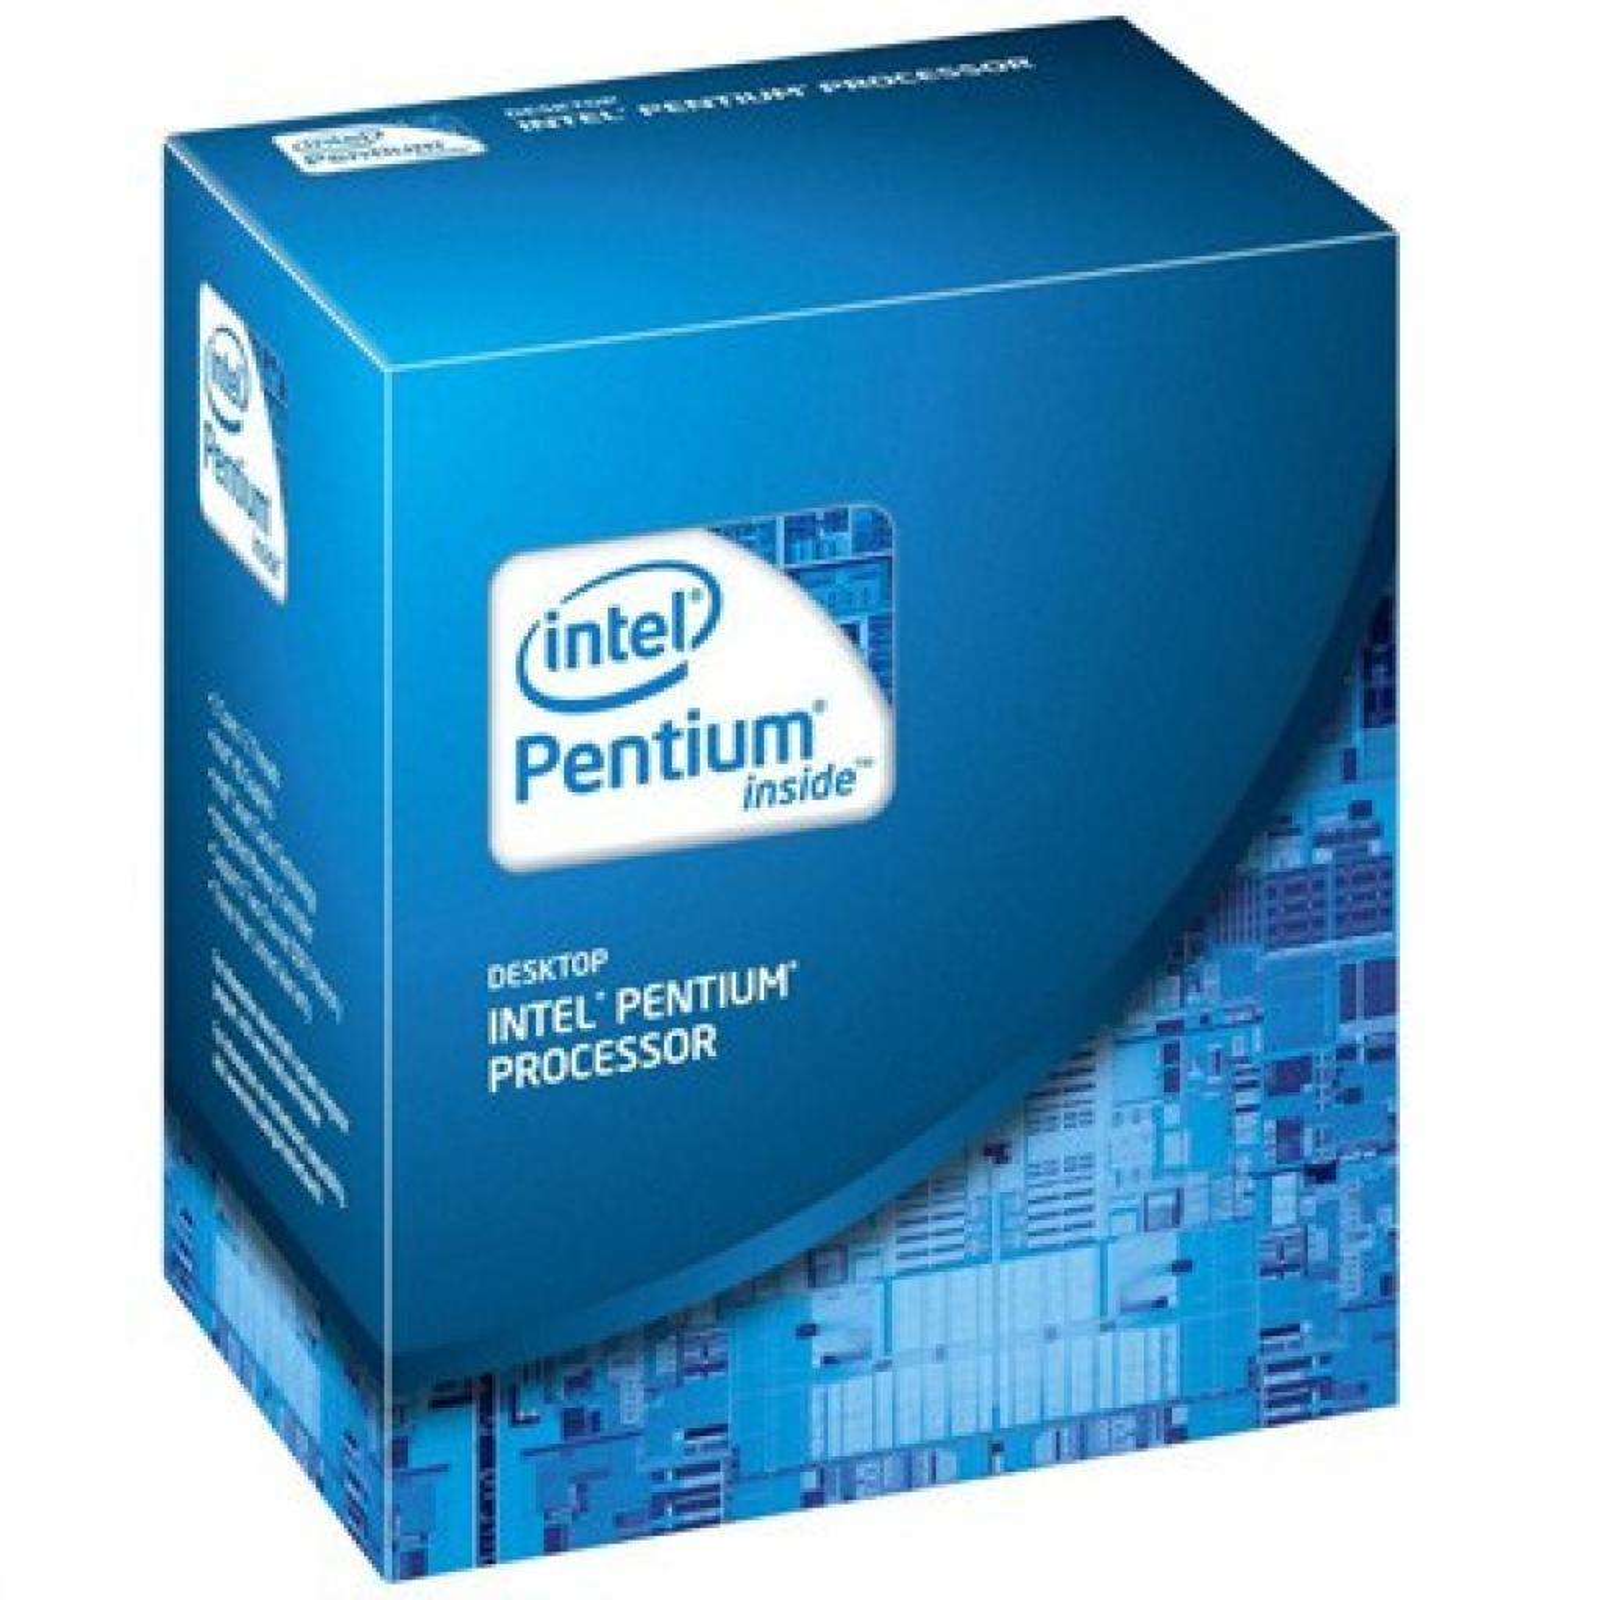 Процессор INTEL Pentium G2020 (BX80637G2020)